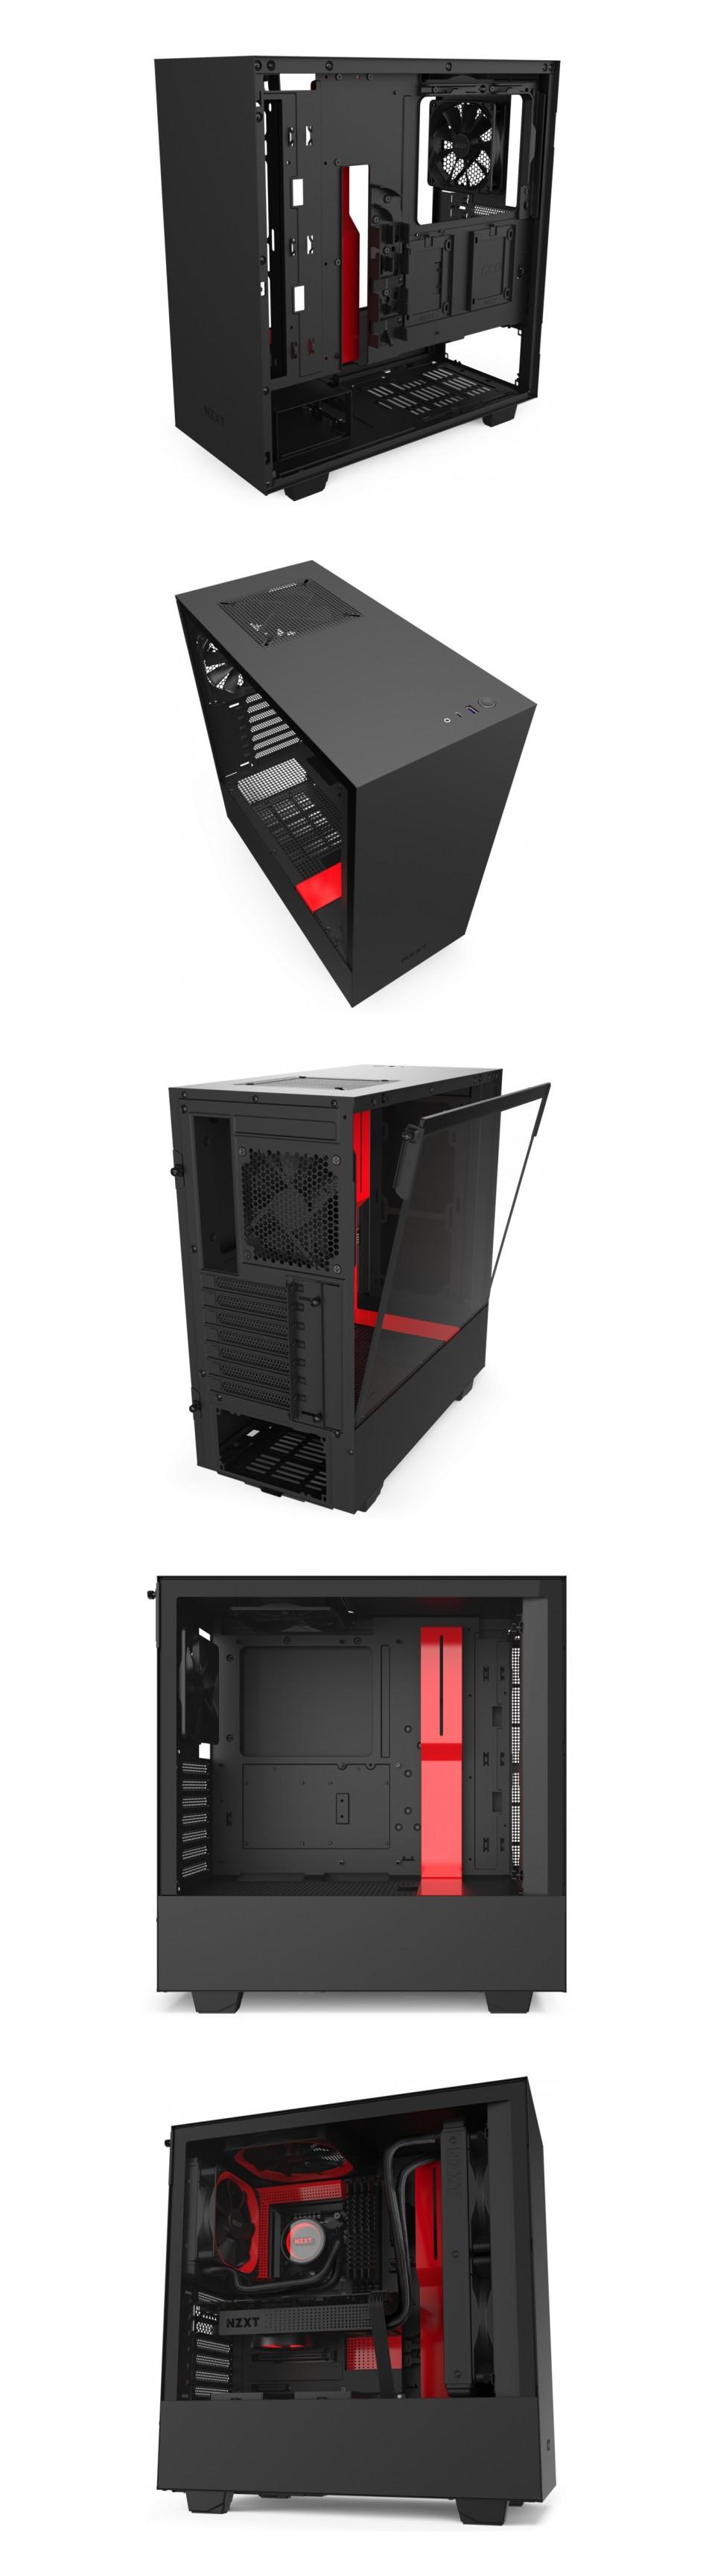 Buy Nzxt H510 Mid Tower Case Matte Black Red Ca H510b Br Pc Case Gear Australia